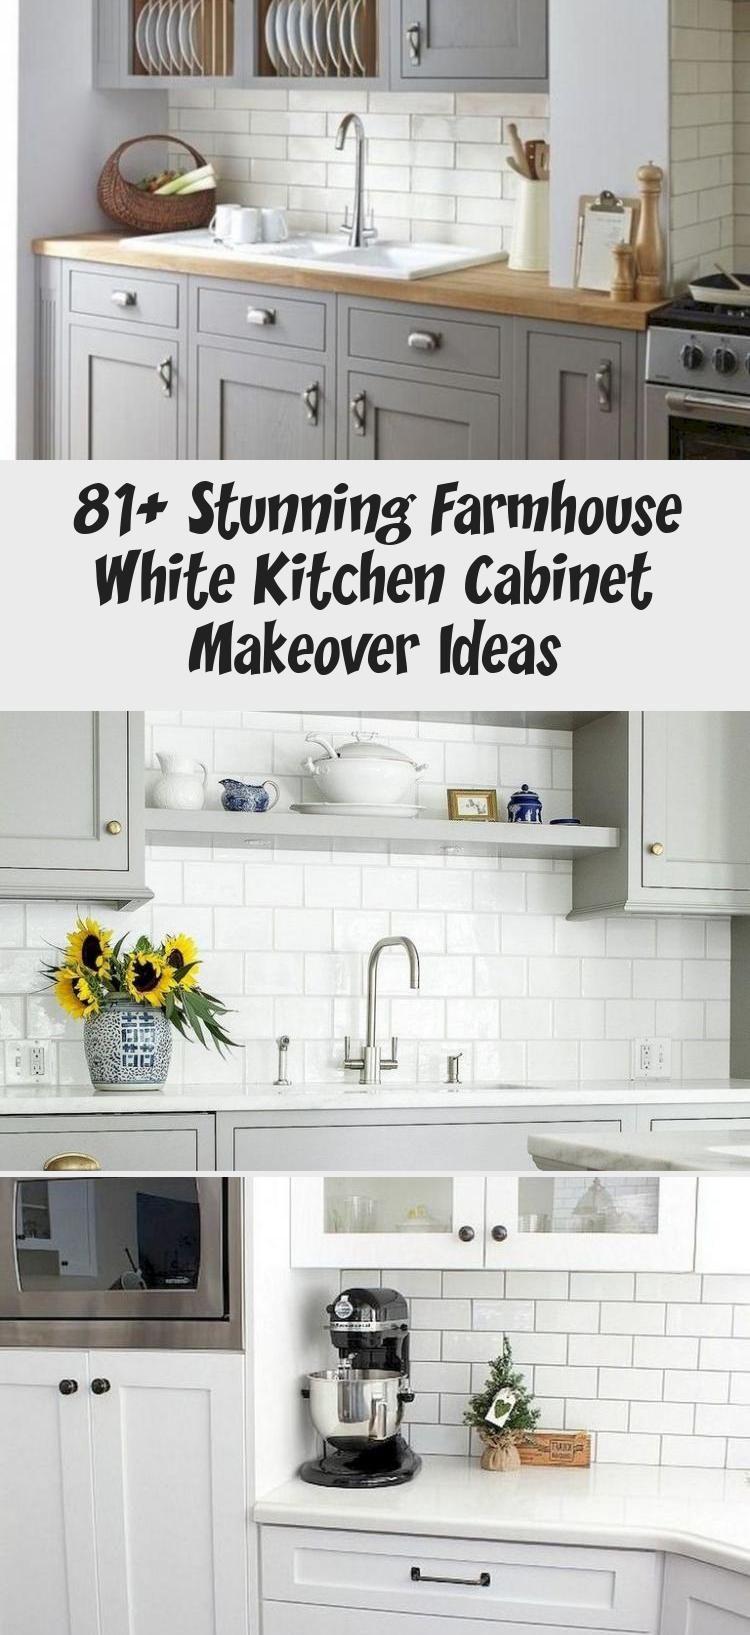 9+ Stunning Farmhouse White Kitchen Cabinet Makeover Ideas ...